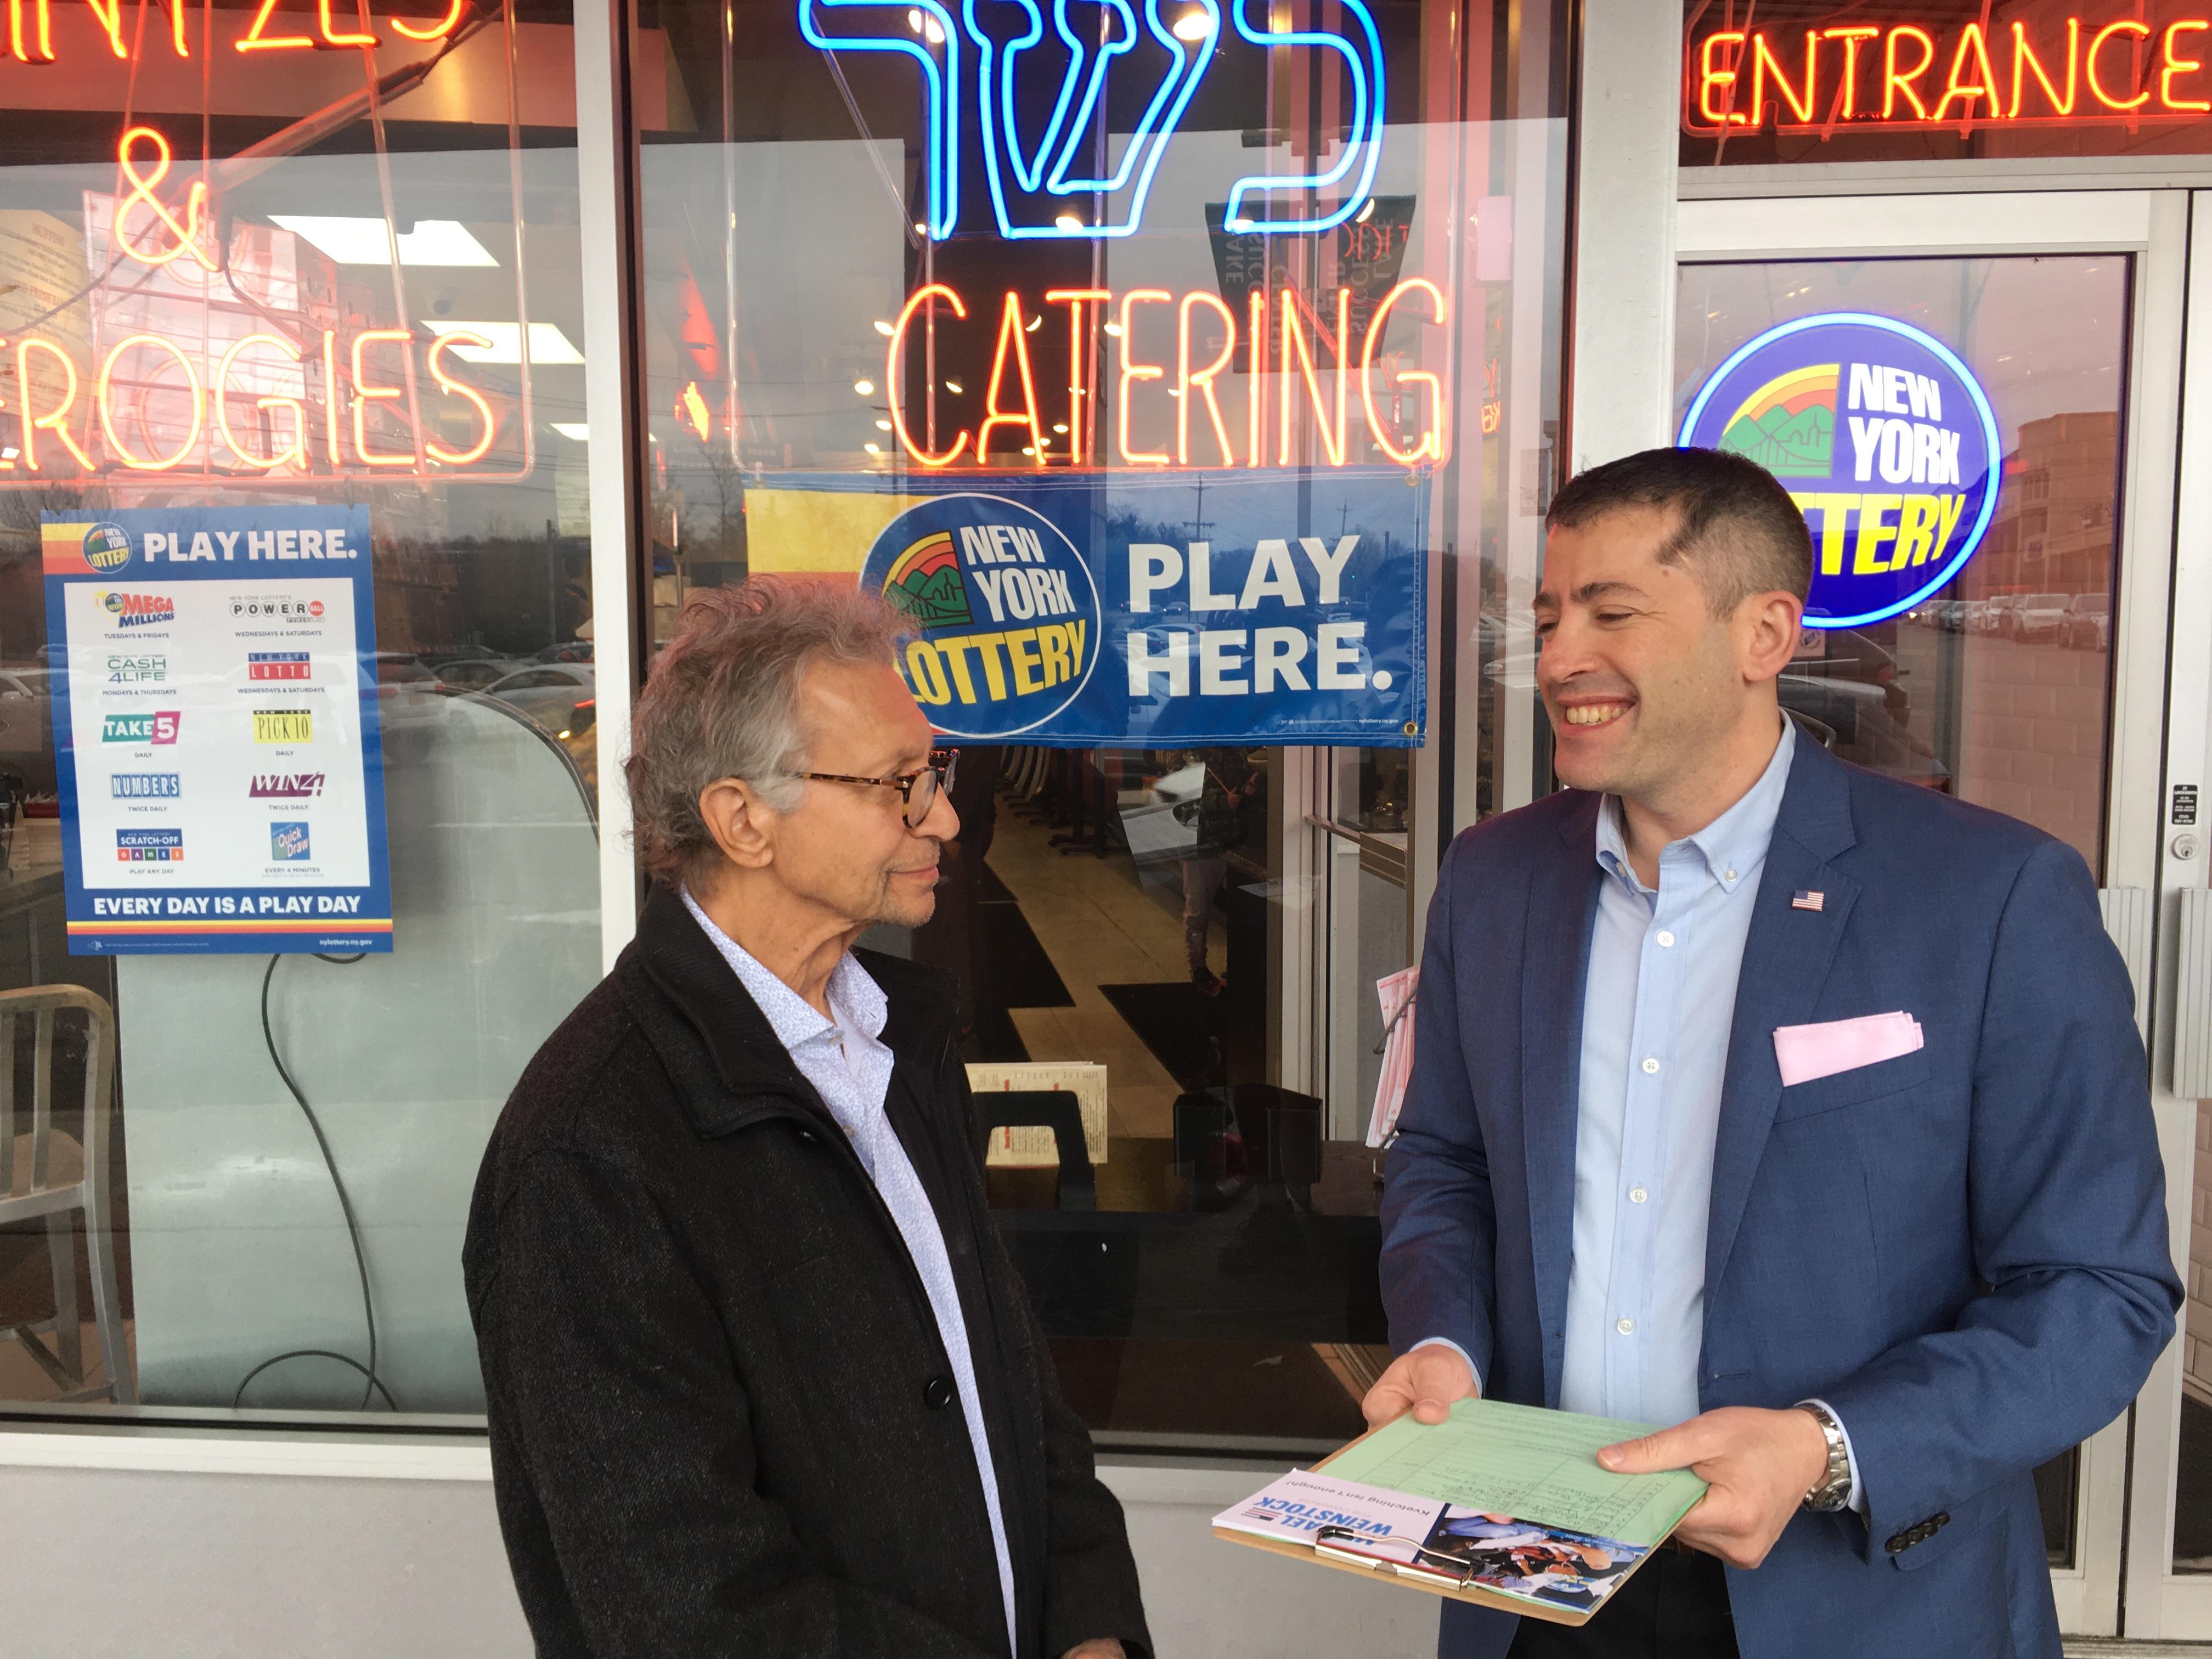 Weinstock Continues Campaigning Despite Coronavirus Challenges